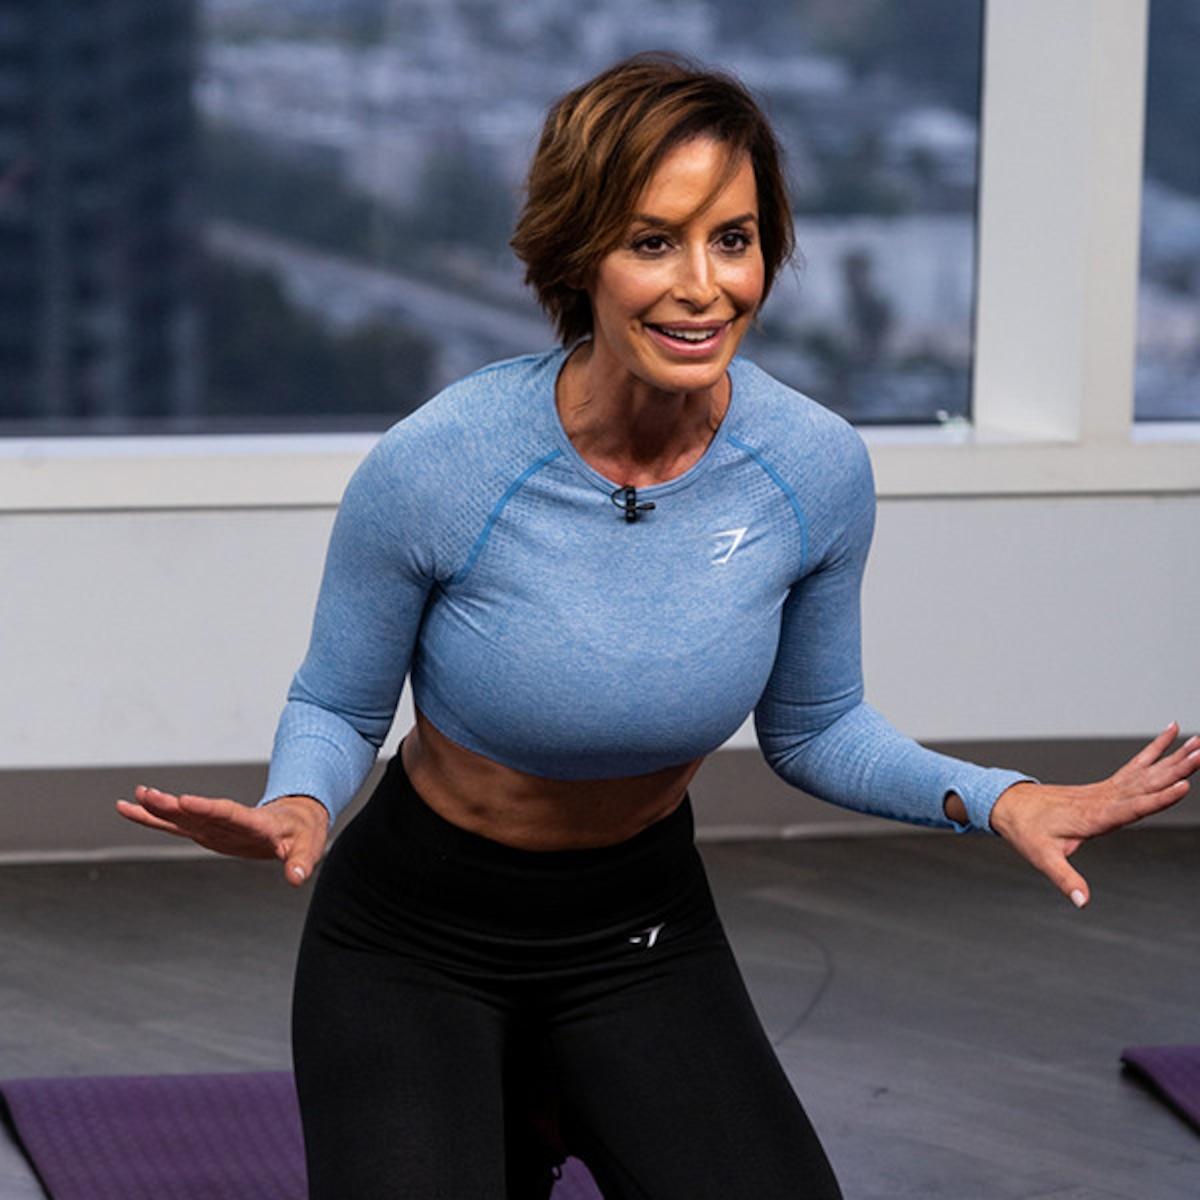 best deals on look for in stock Hear Revenge Body Trainer Ashley Borden's Workout Tips on | E!